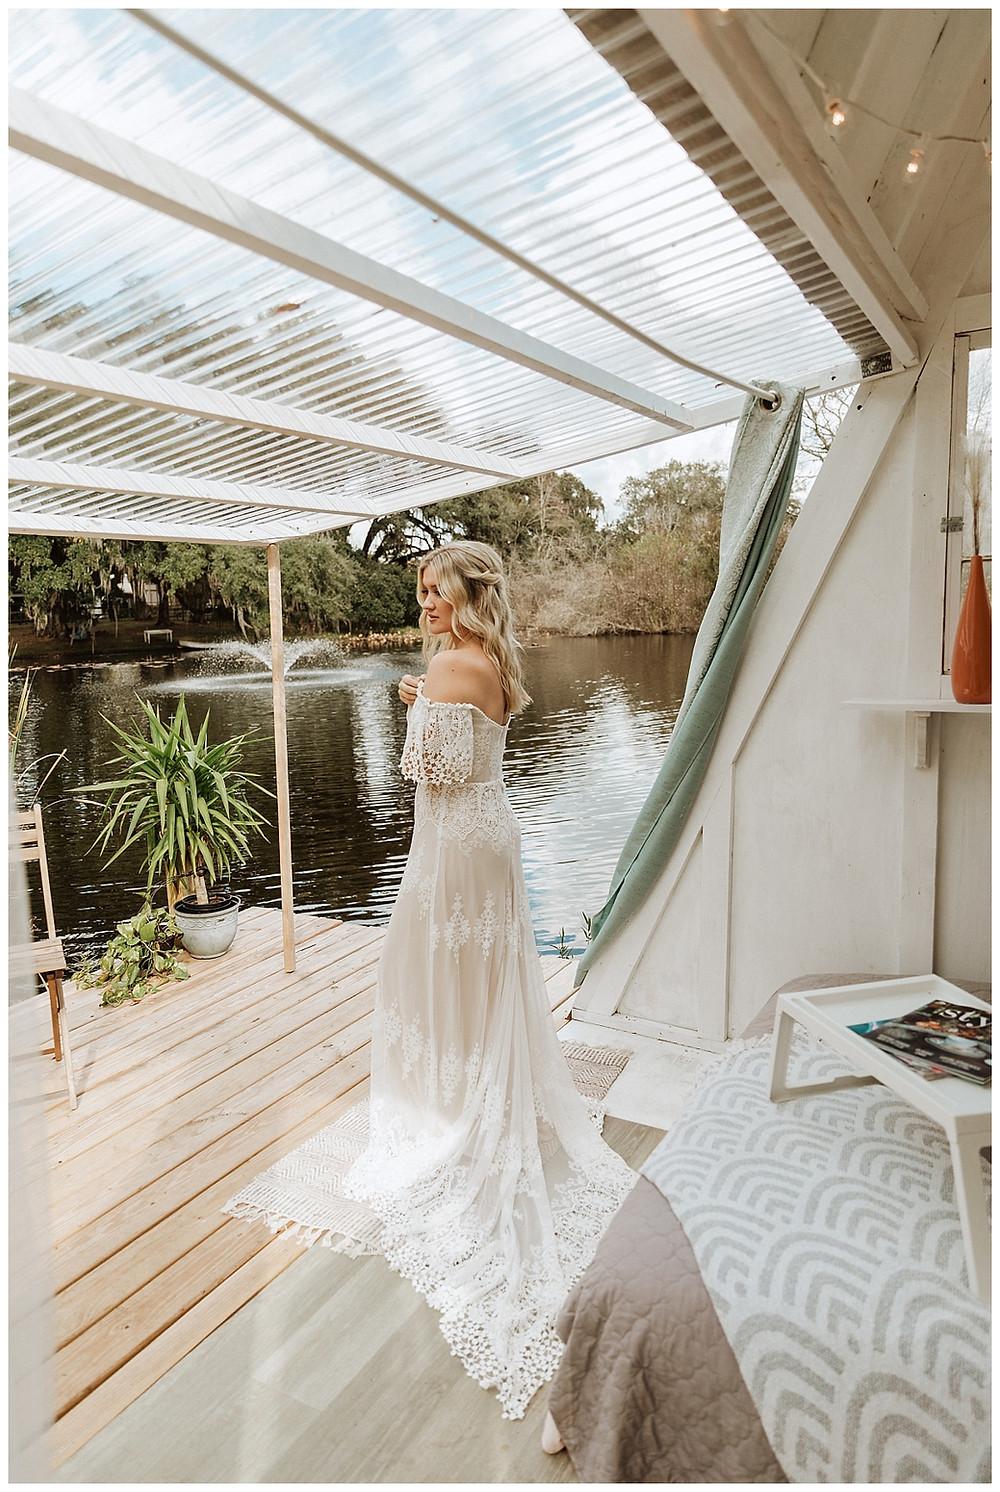 Lakehouse Boho Bridal Portraits | Dreamers and Lovers Wedding Dress